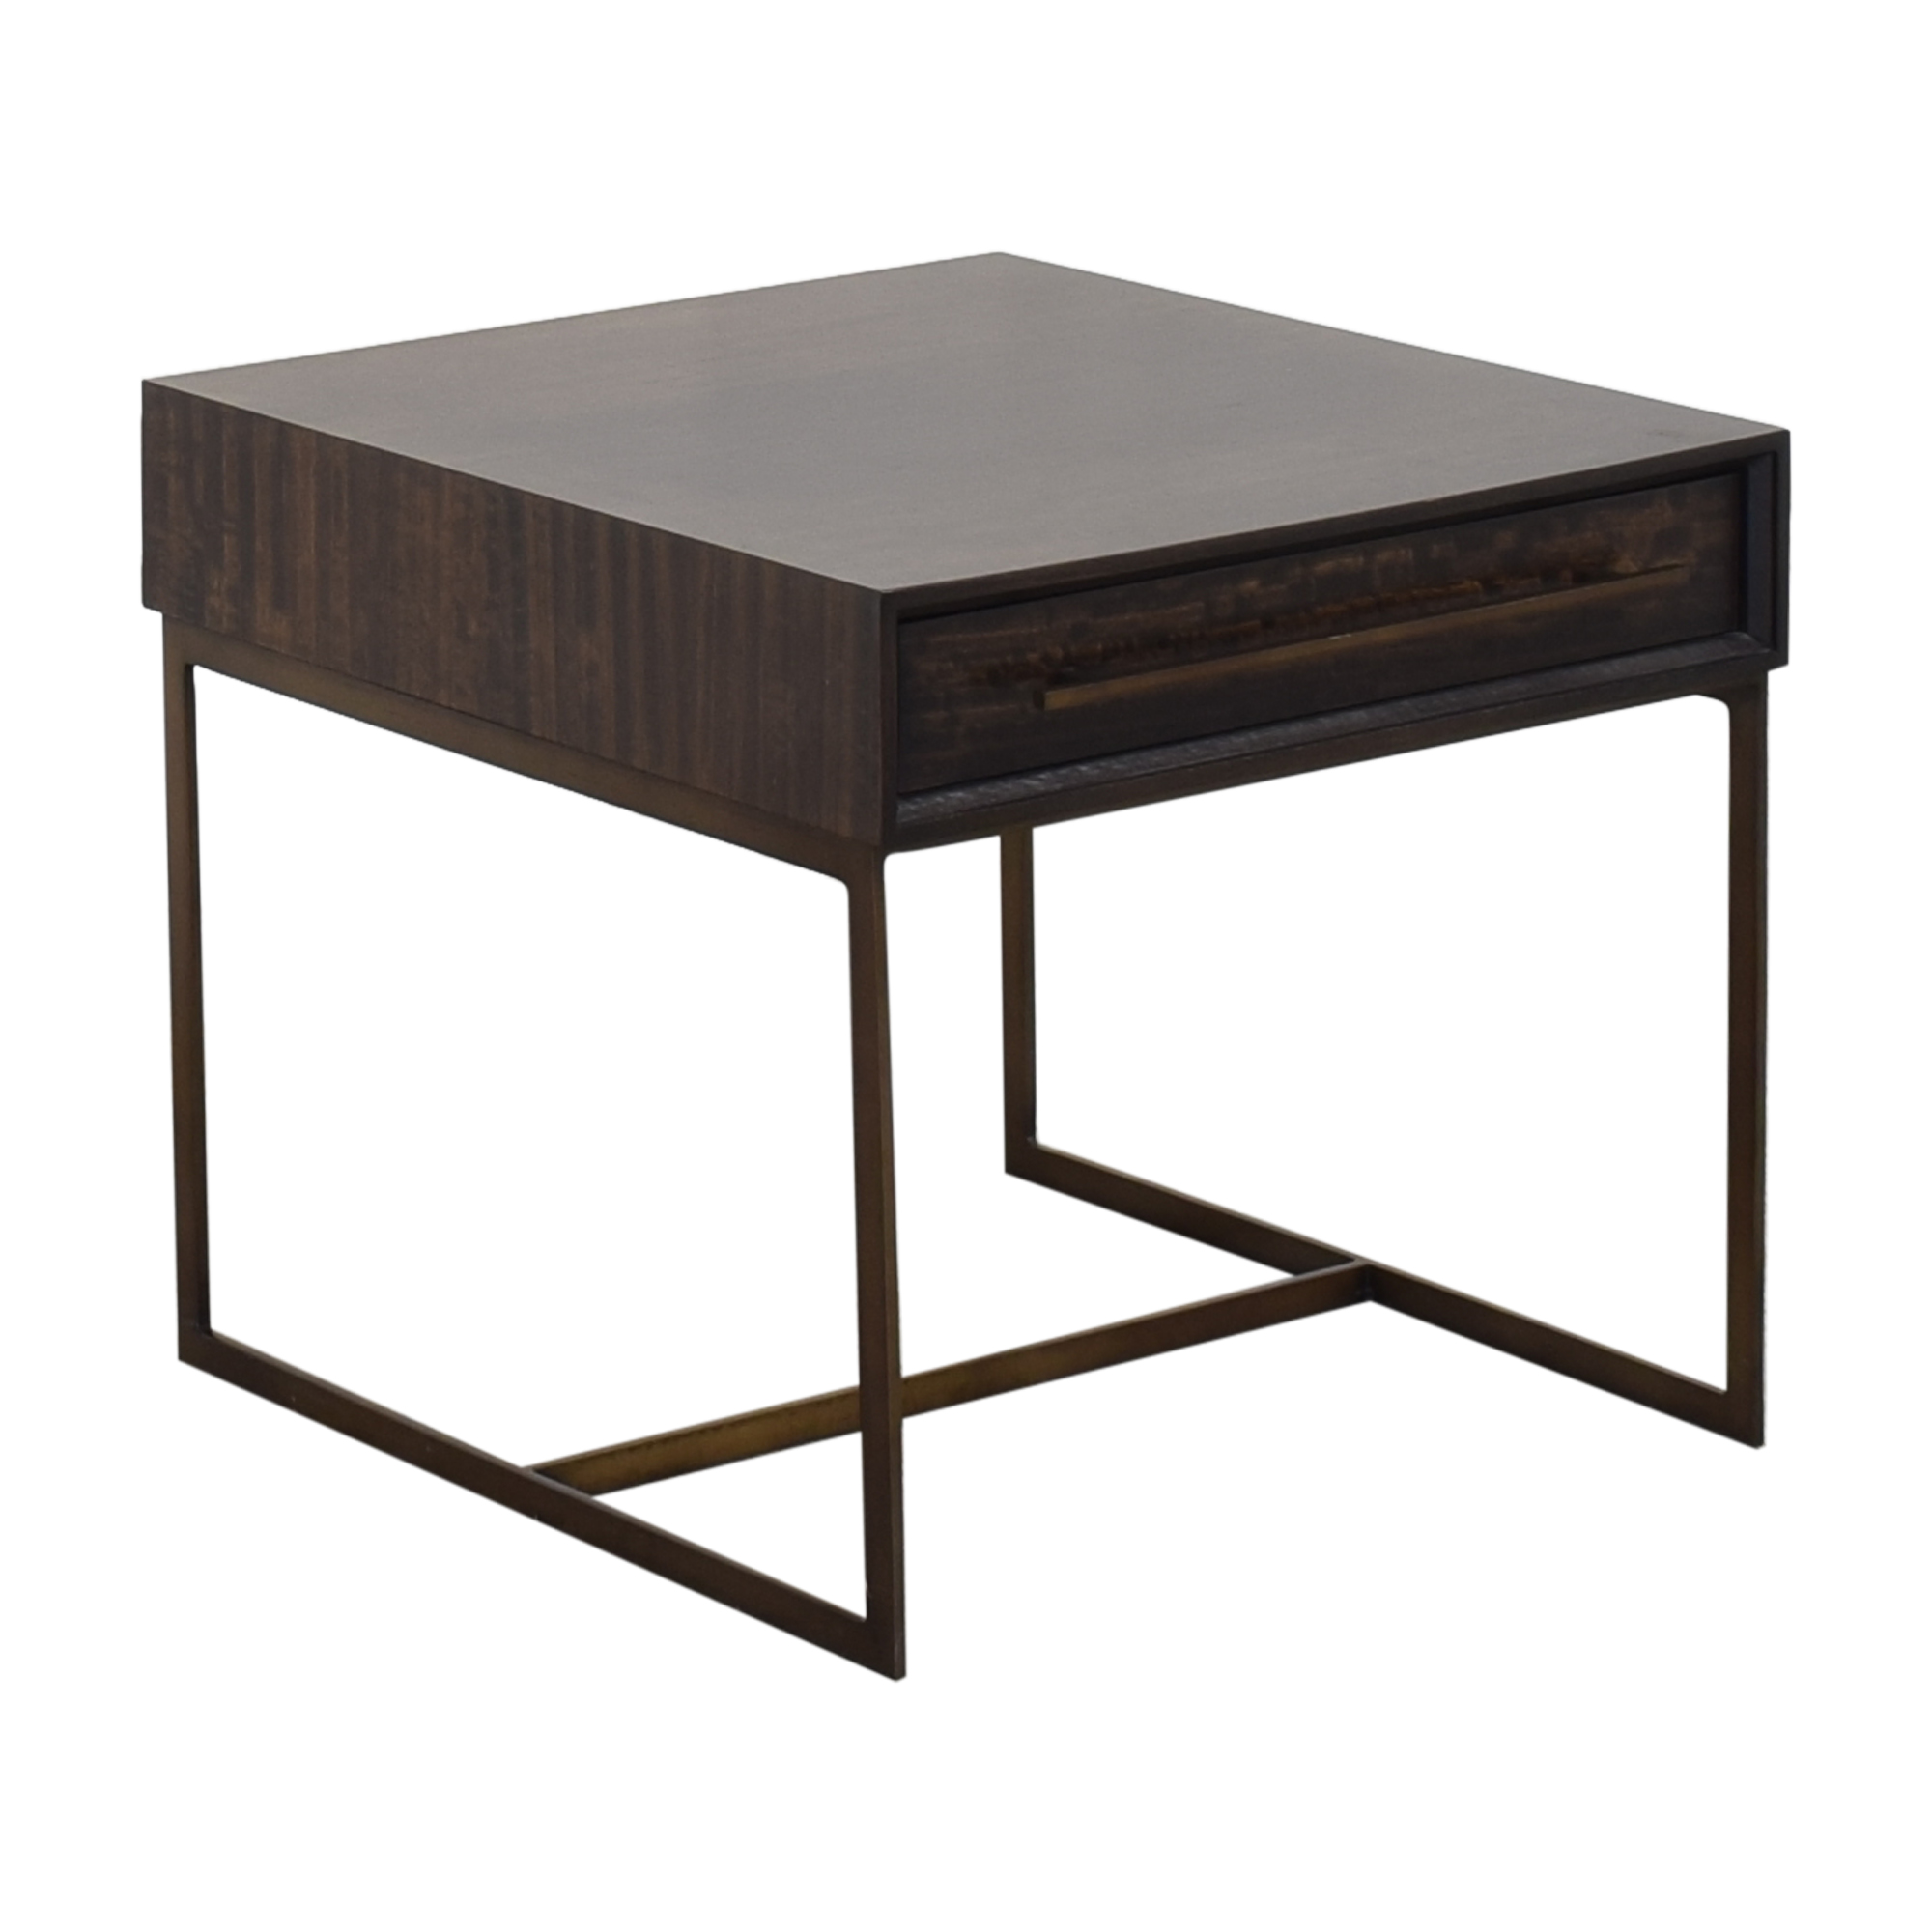 Mitchell Gold + Bob Williams Mitchell Gold + Bob Williams Allure Drawer Side Table ma